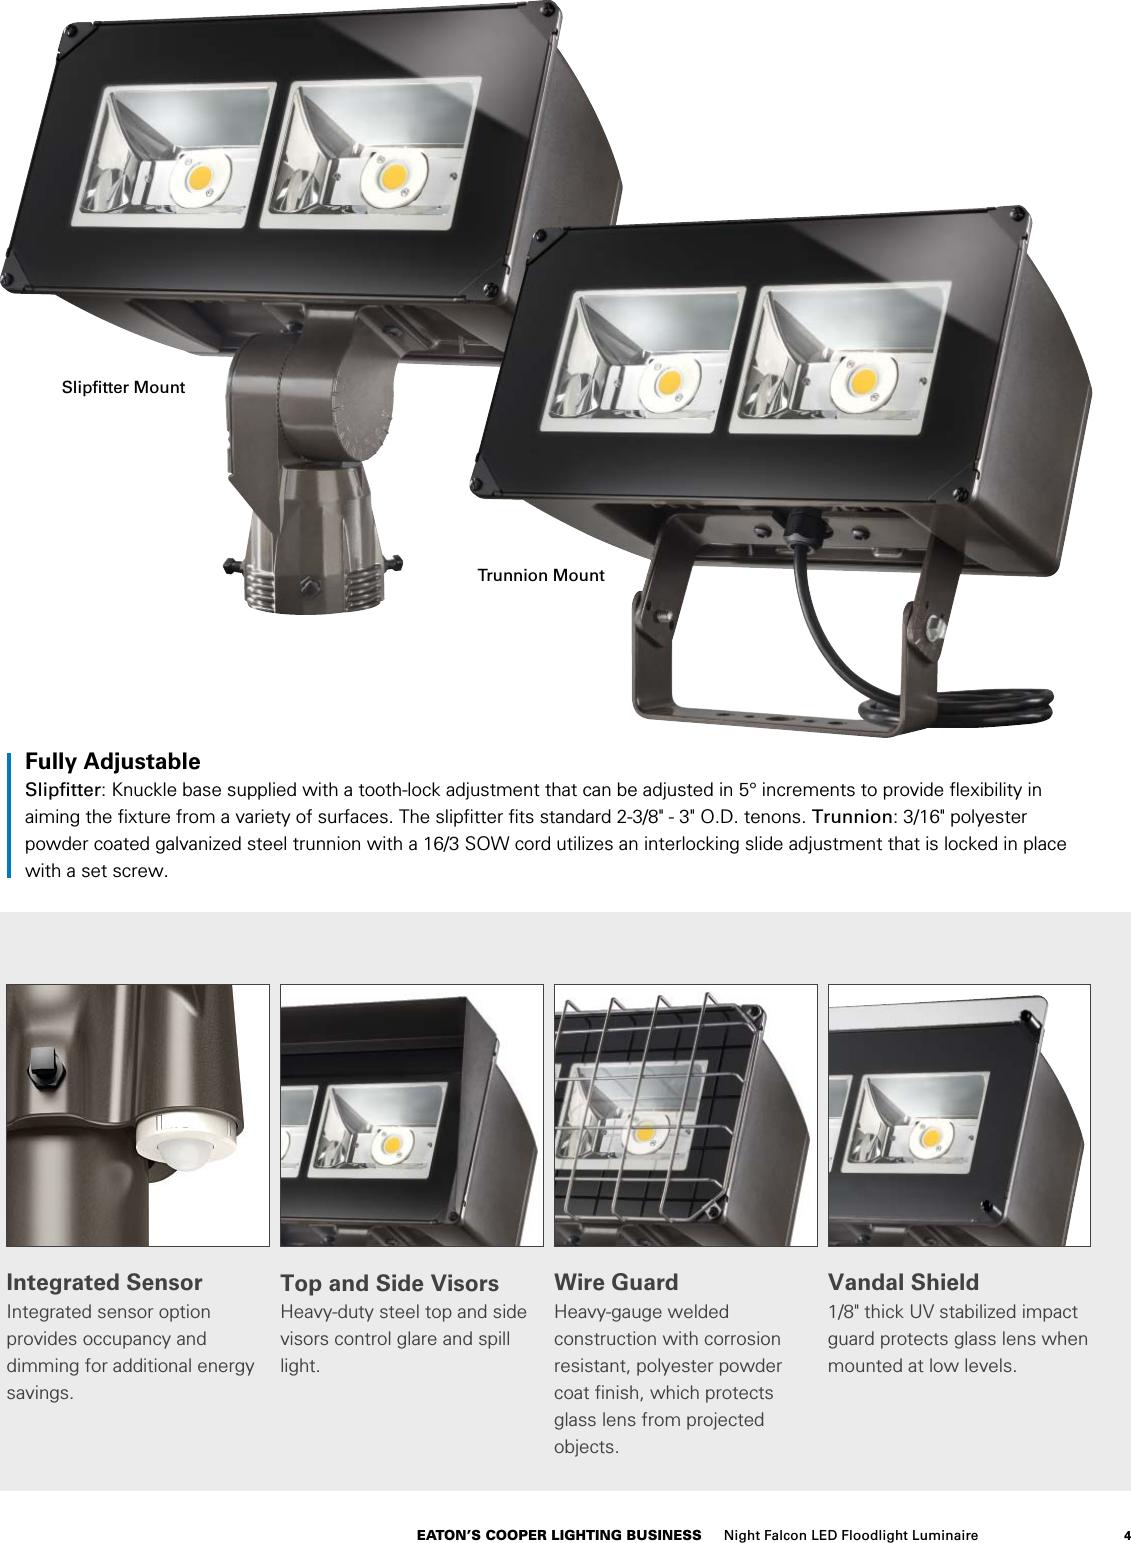 Lumark Night Falcon LED Floodlight Brochure 1000441946 Catalog